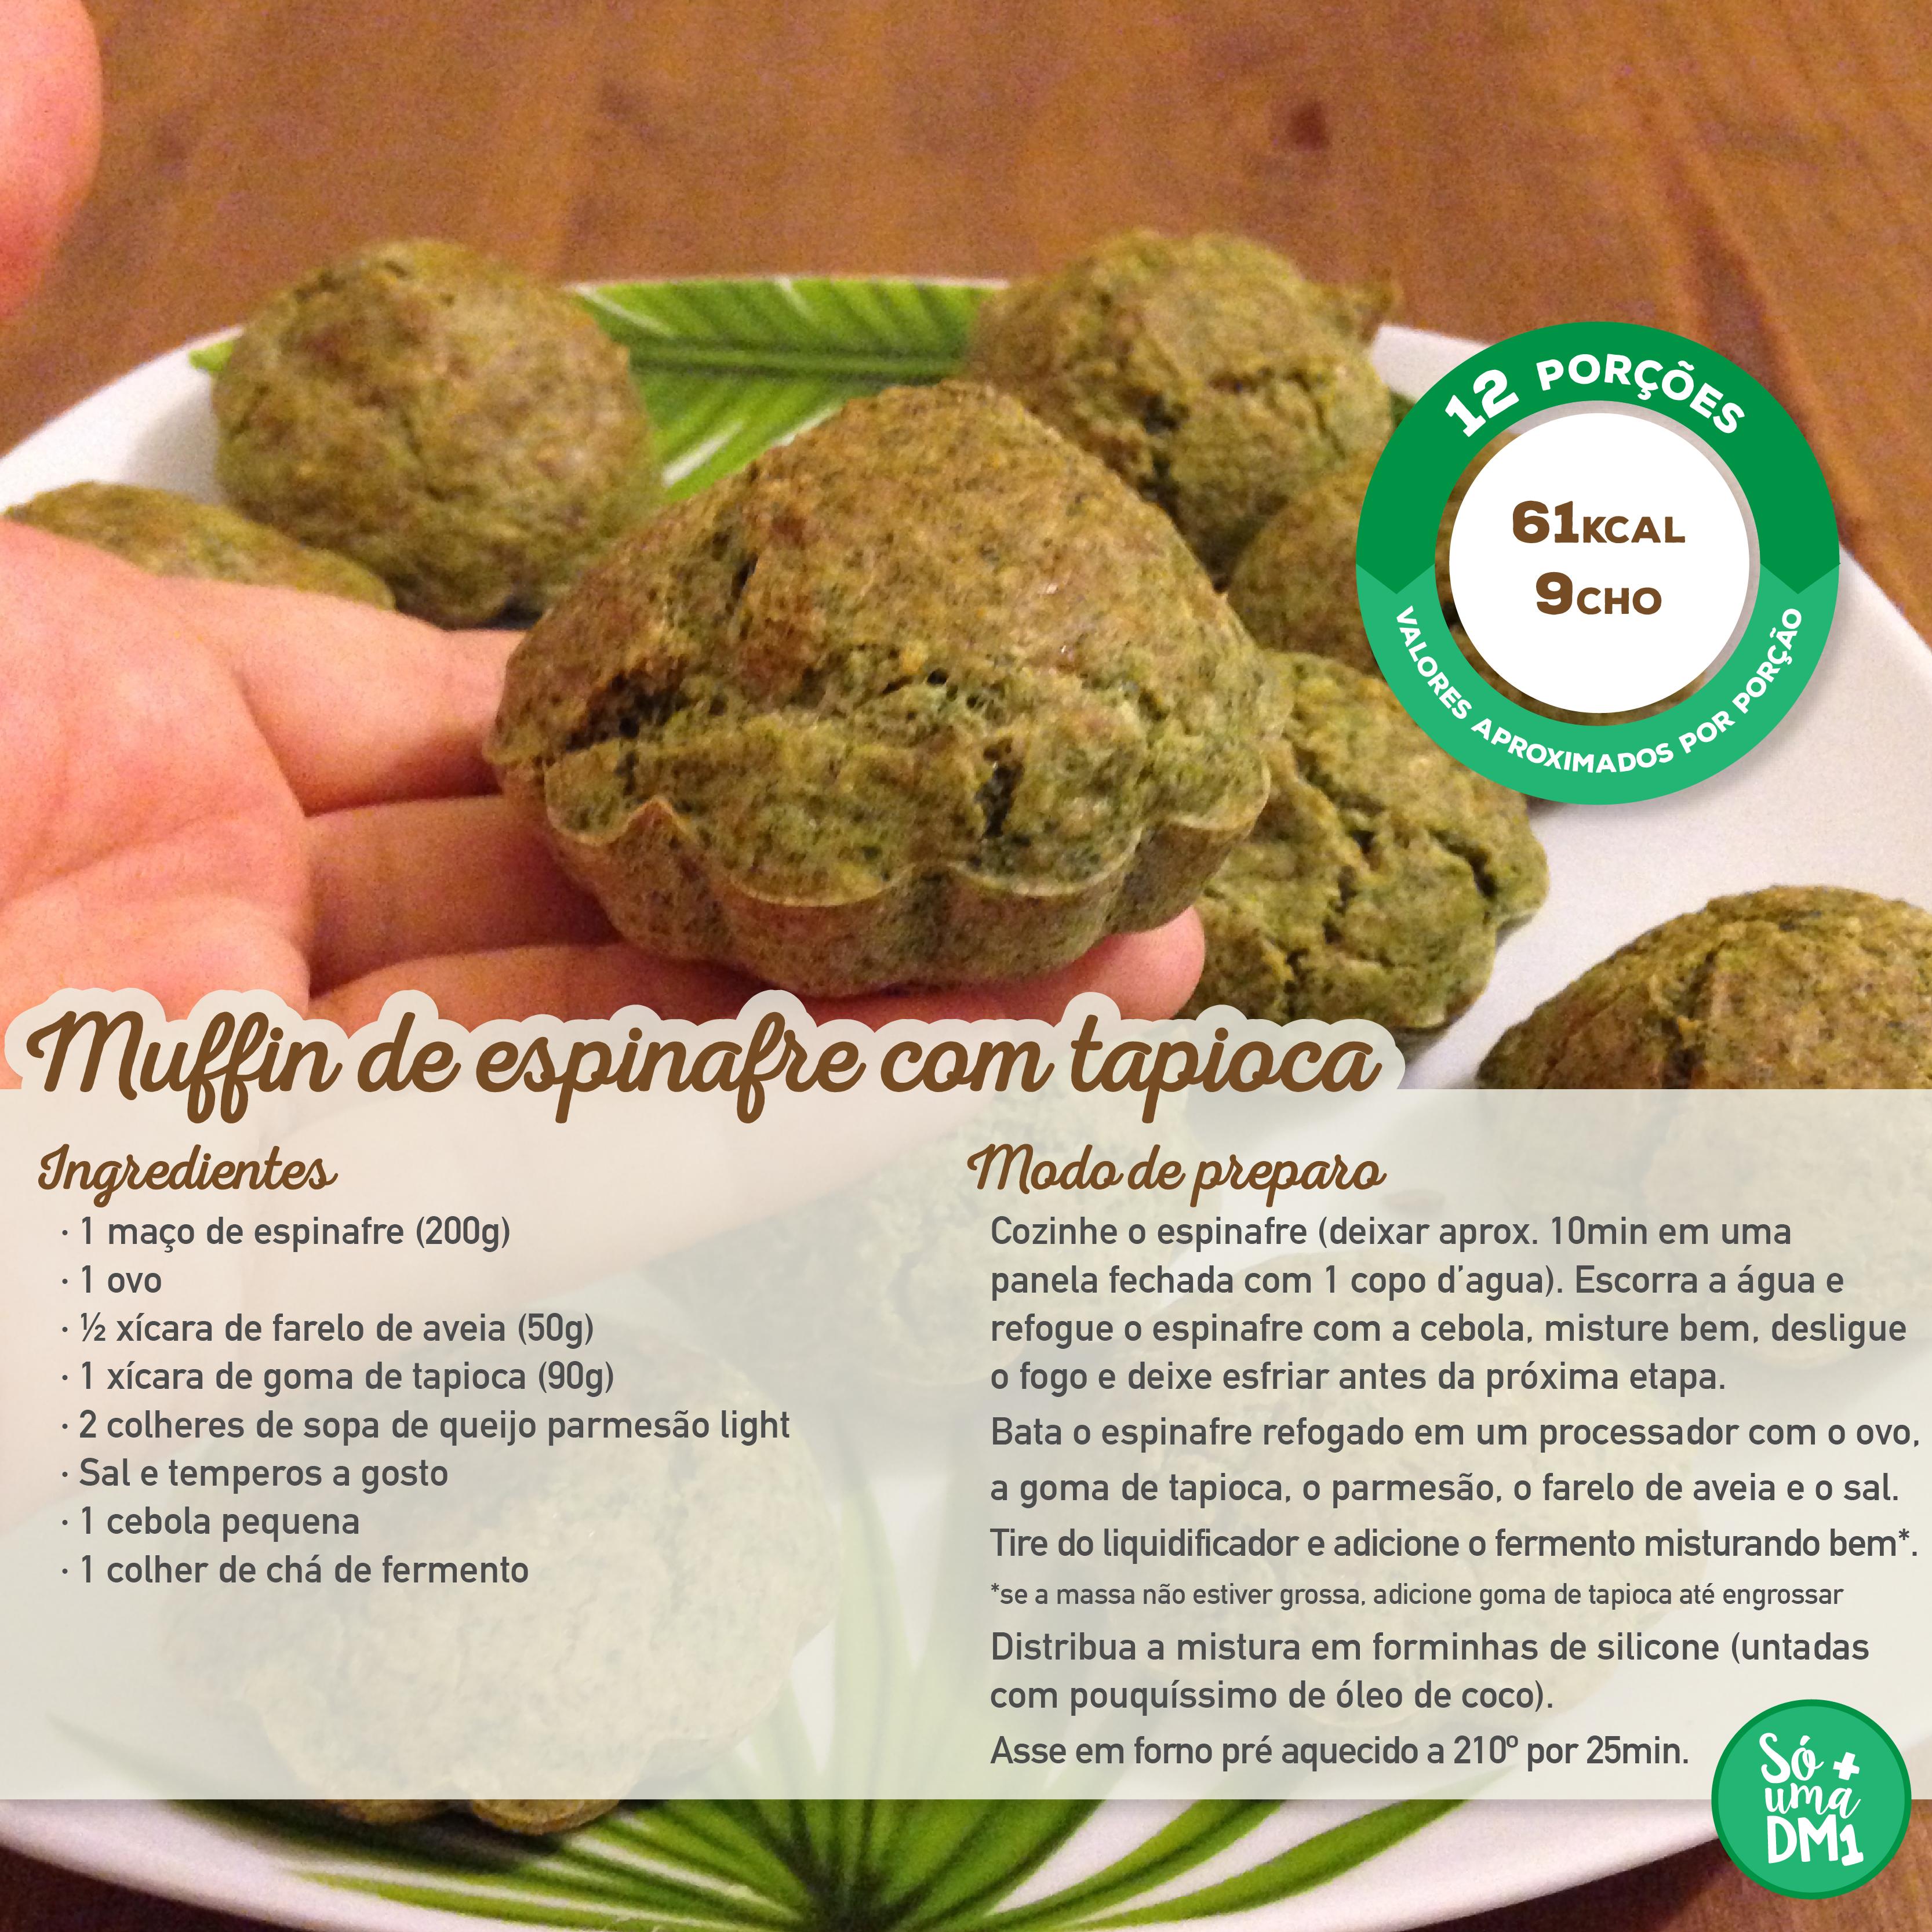 Muffin de espinafre com tapioca